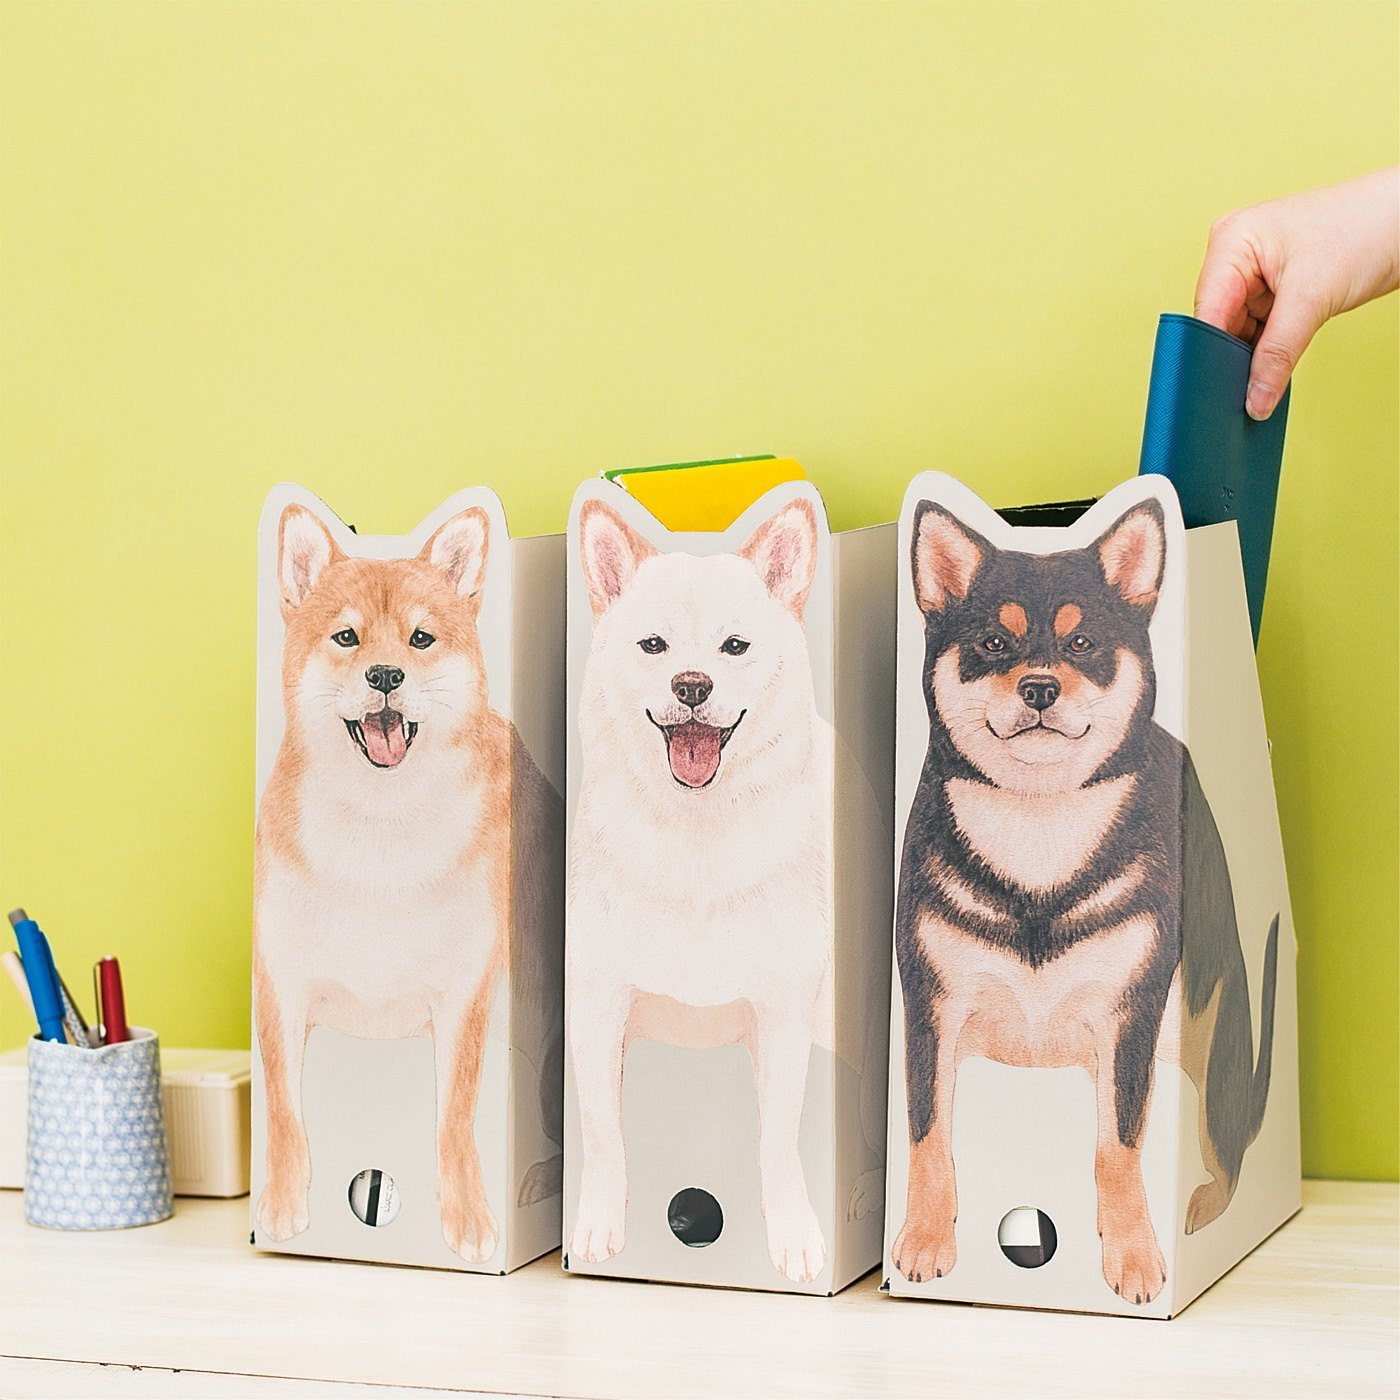 YOU+MORE! おうちでキリリとスタンバイ 柴犬おすわりファイルボックスの会